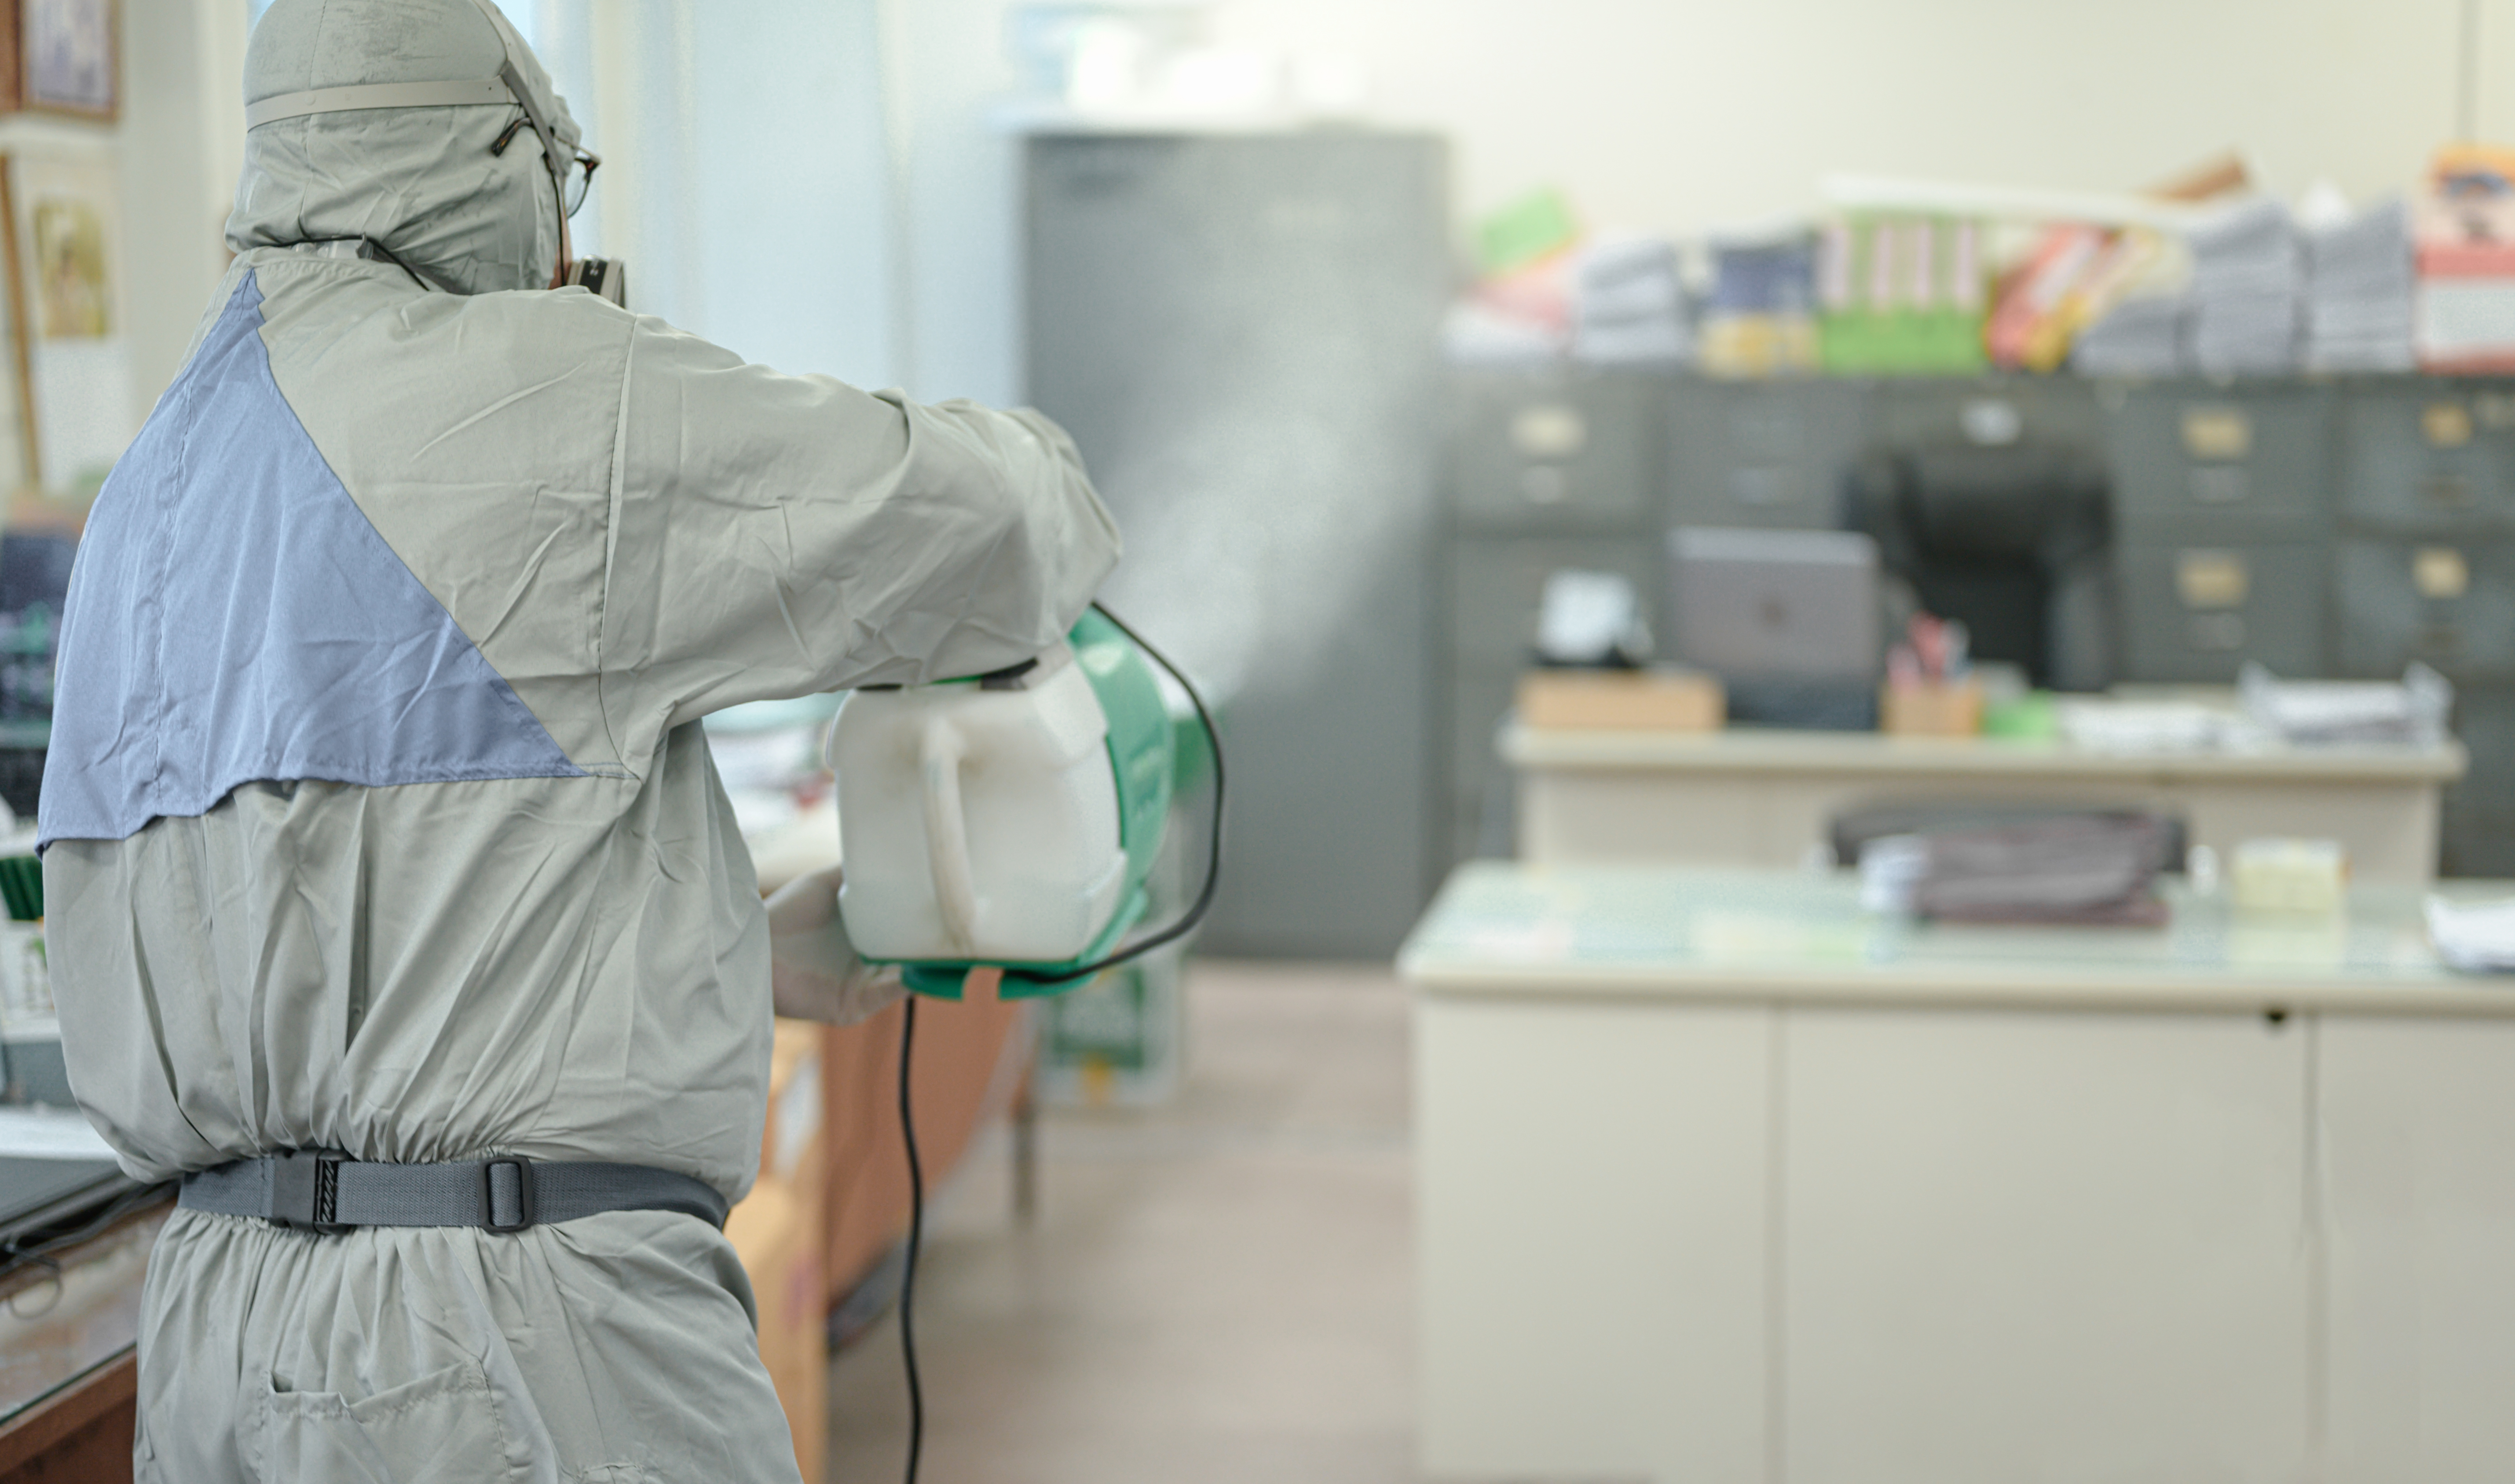 Electrostatic Sprayer benefits